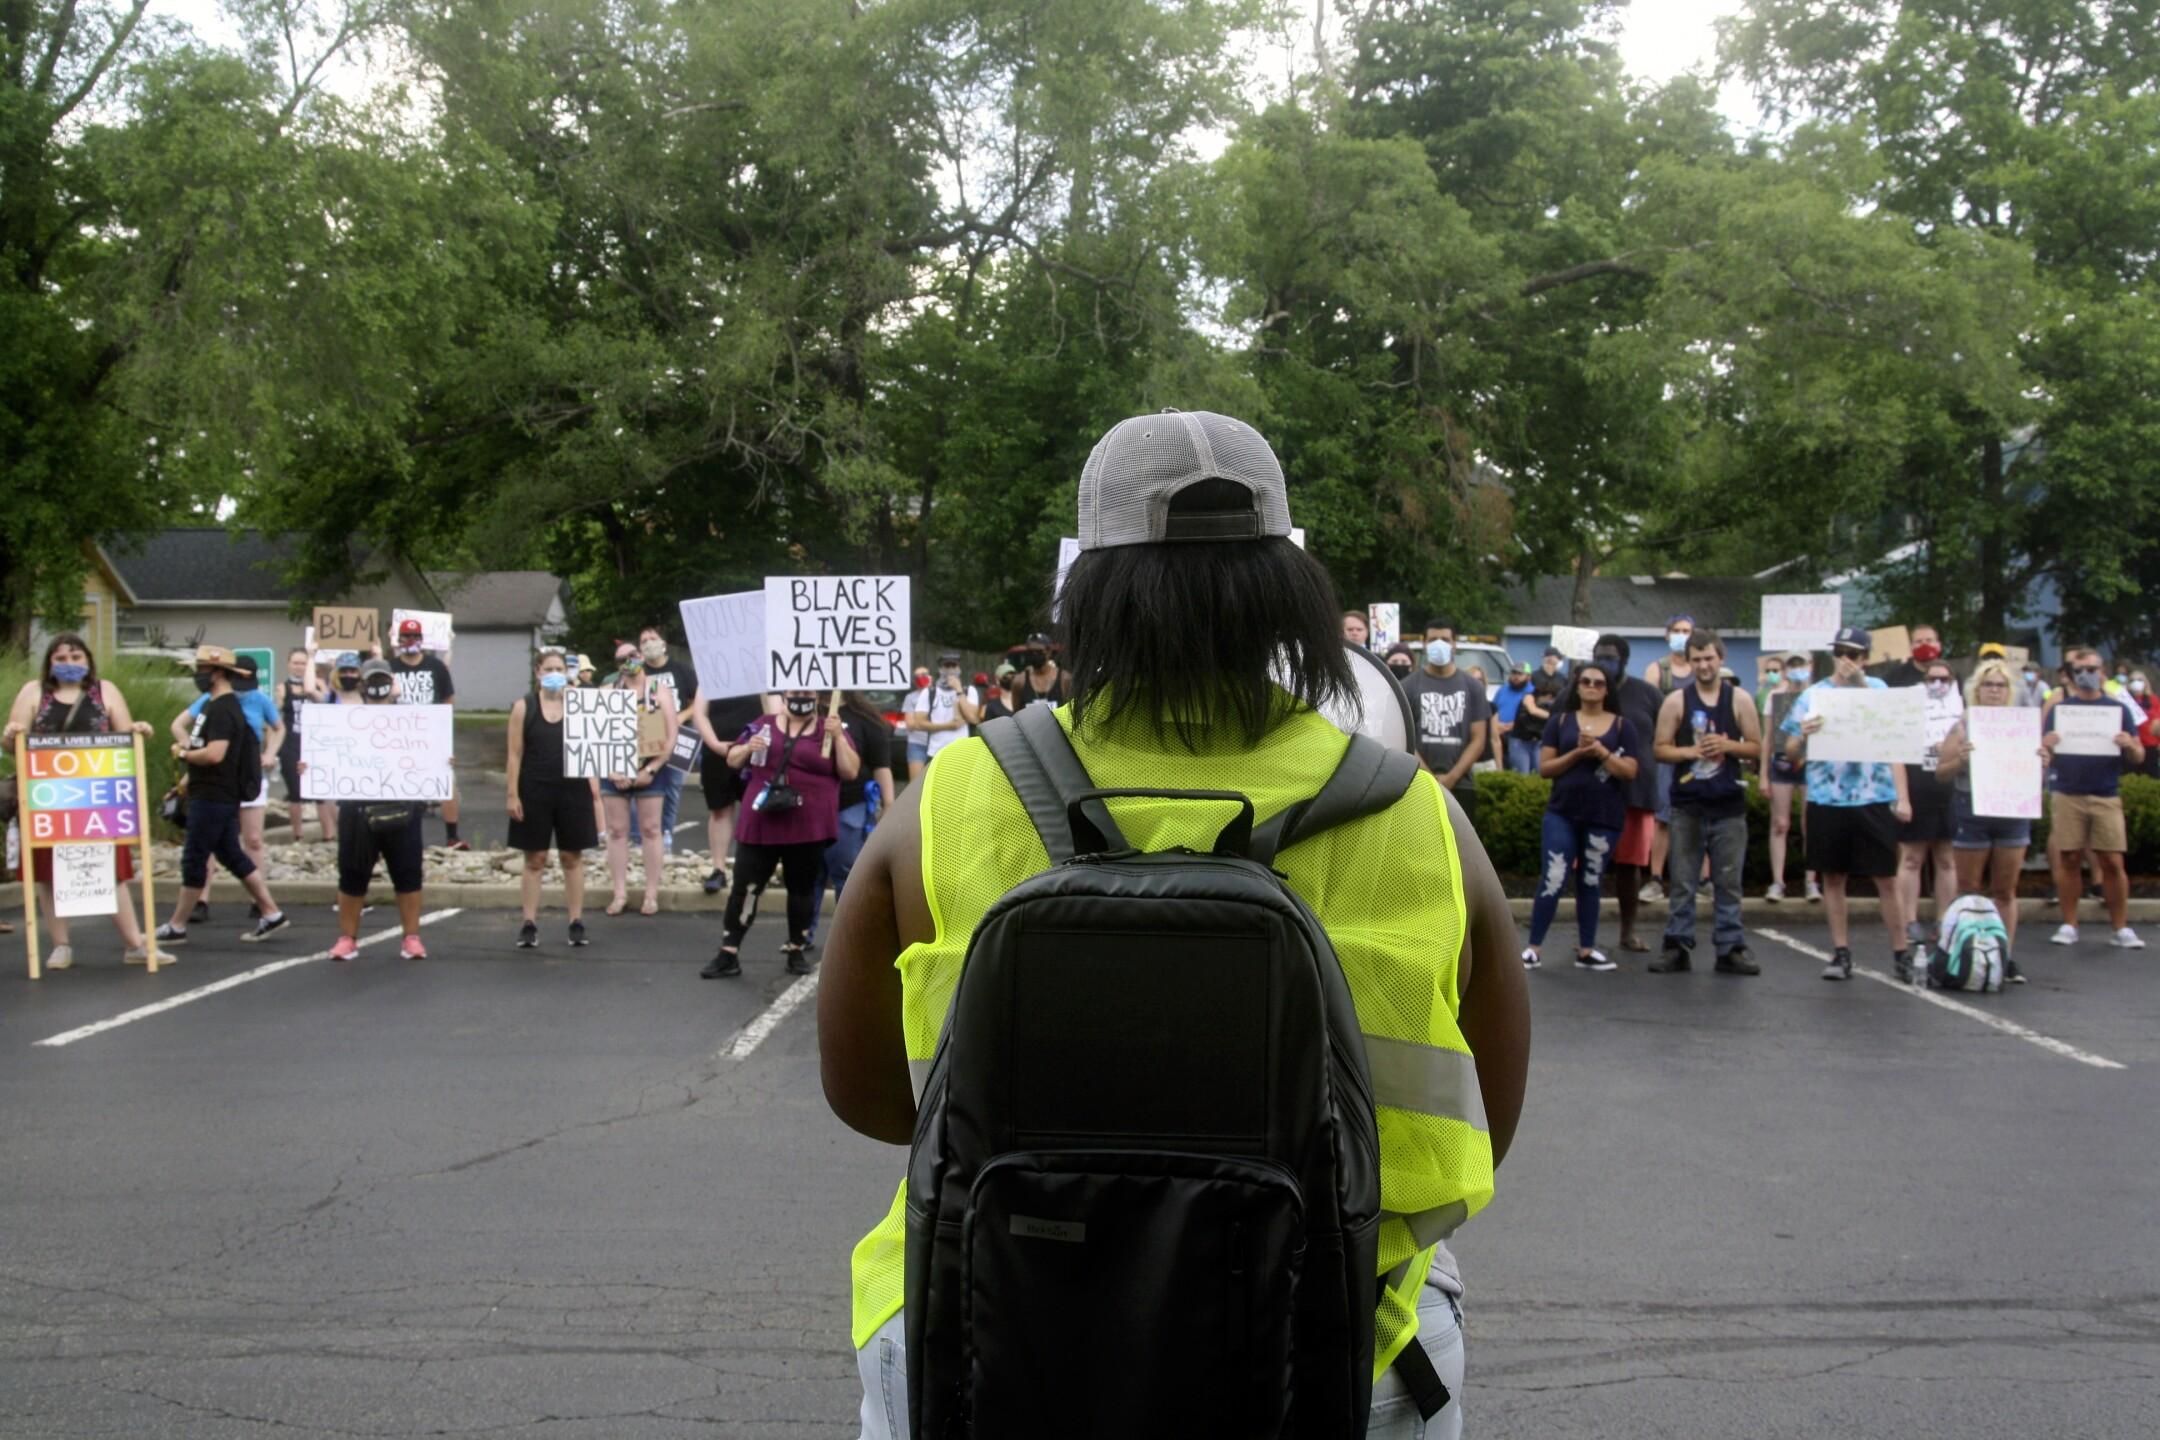 062020_milfordprotest24.jpg